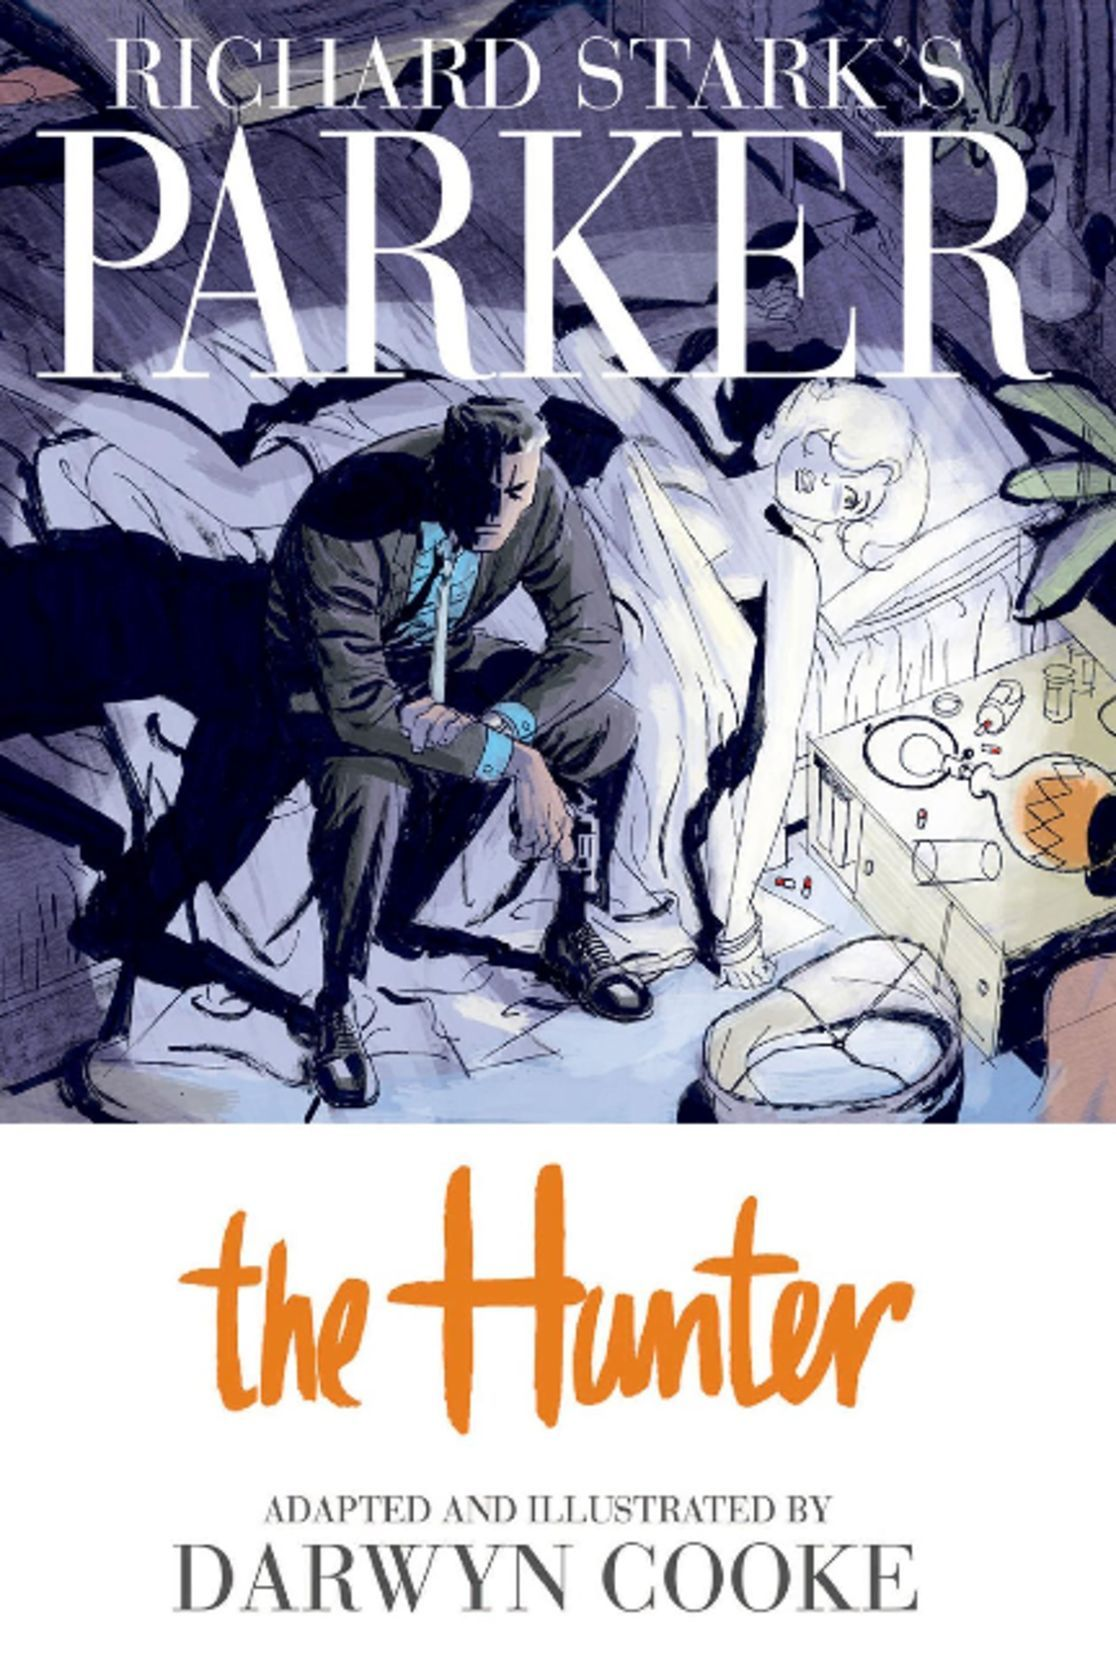 Parker The Hunter Digital